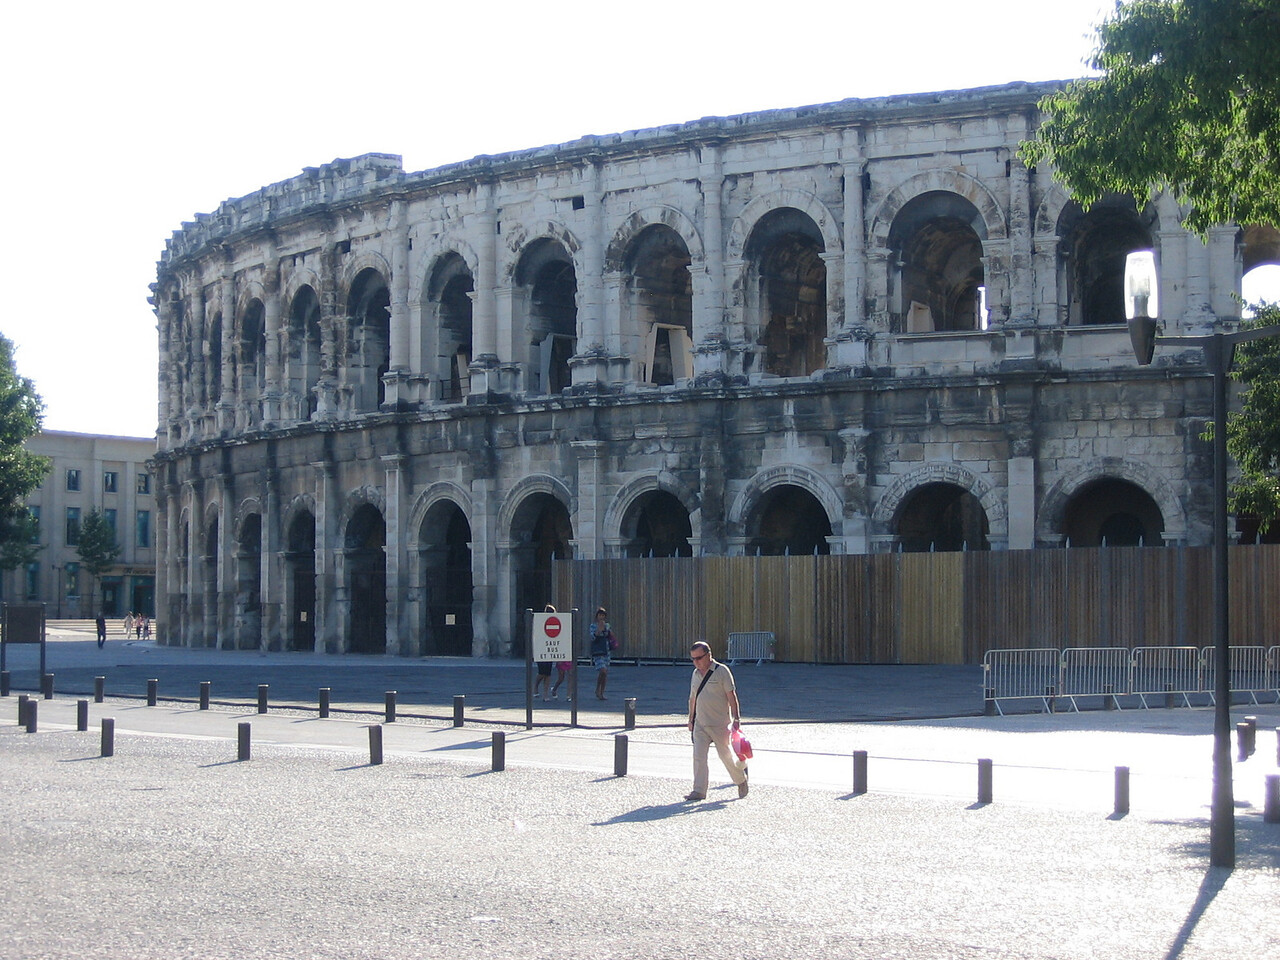 Bull fighting coliseum built in 1st century BC. Location - Nimes